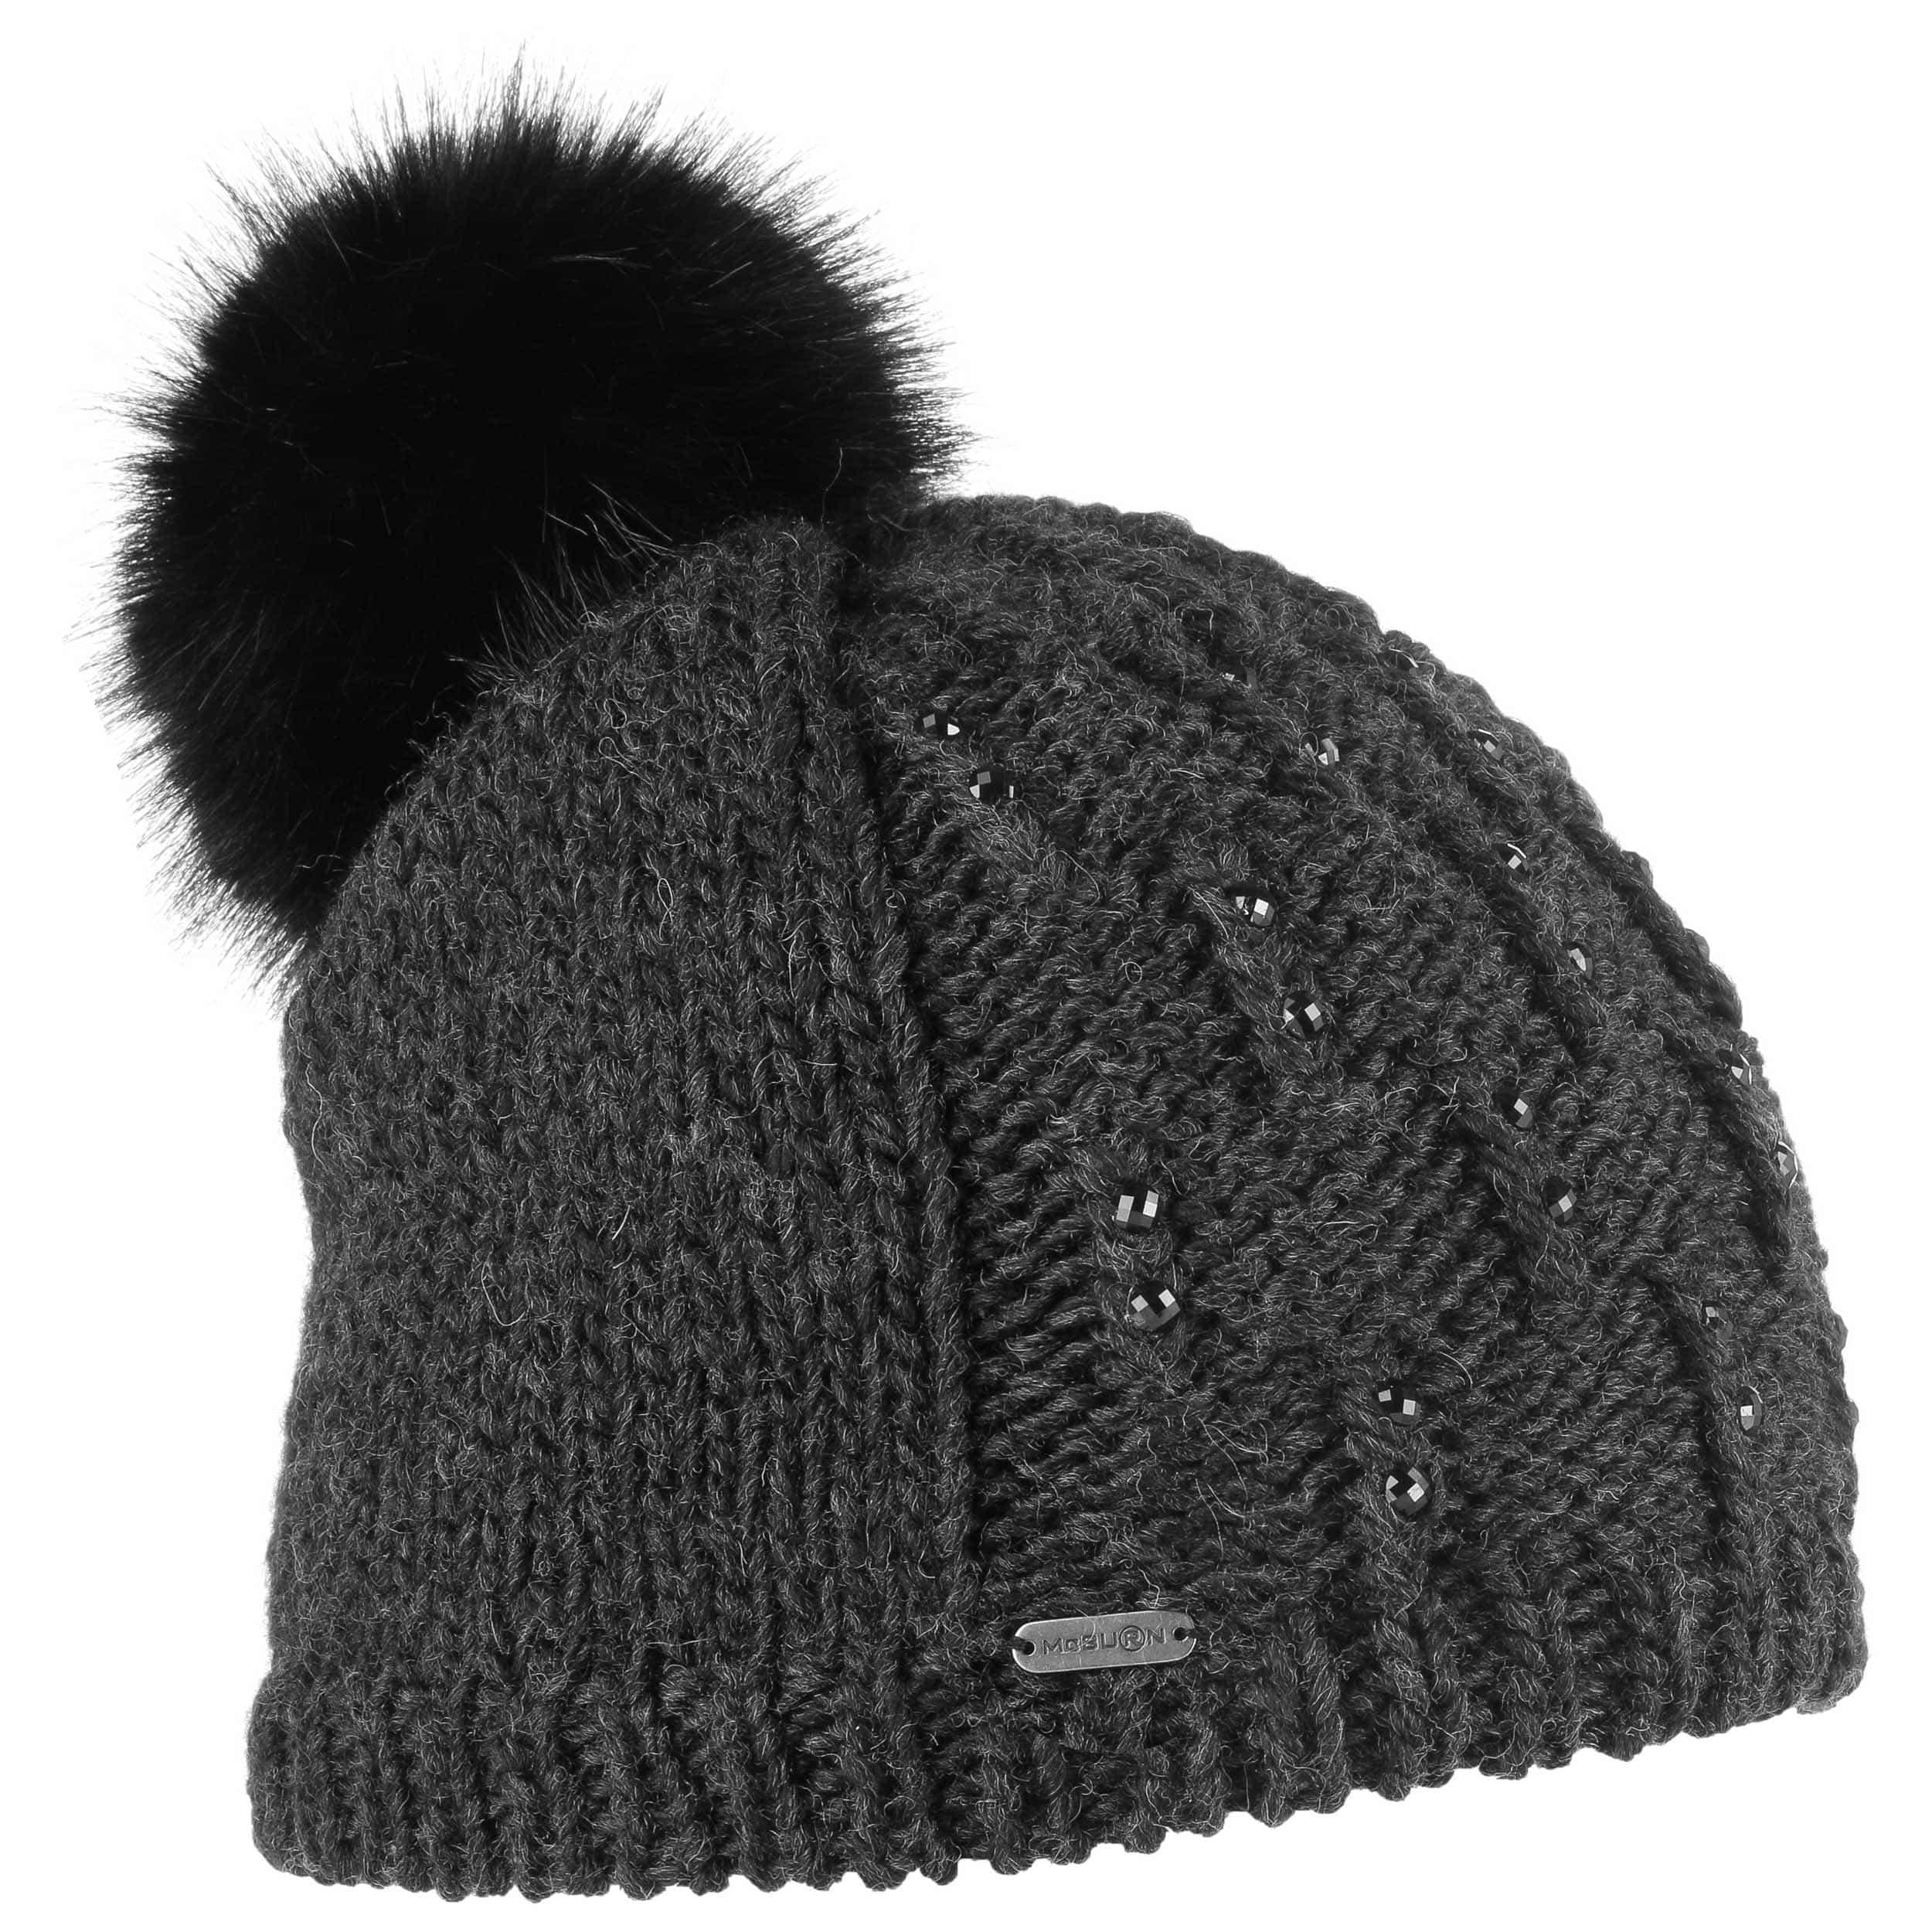 31c3d78a690b2 ... Glitter Beanie Pompom Hat by McBURN - 1